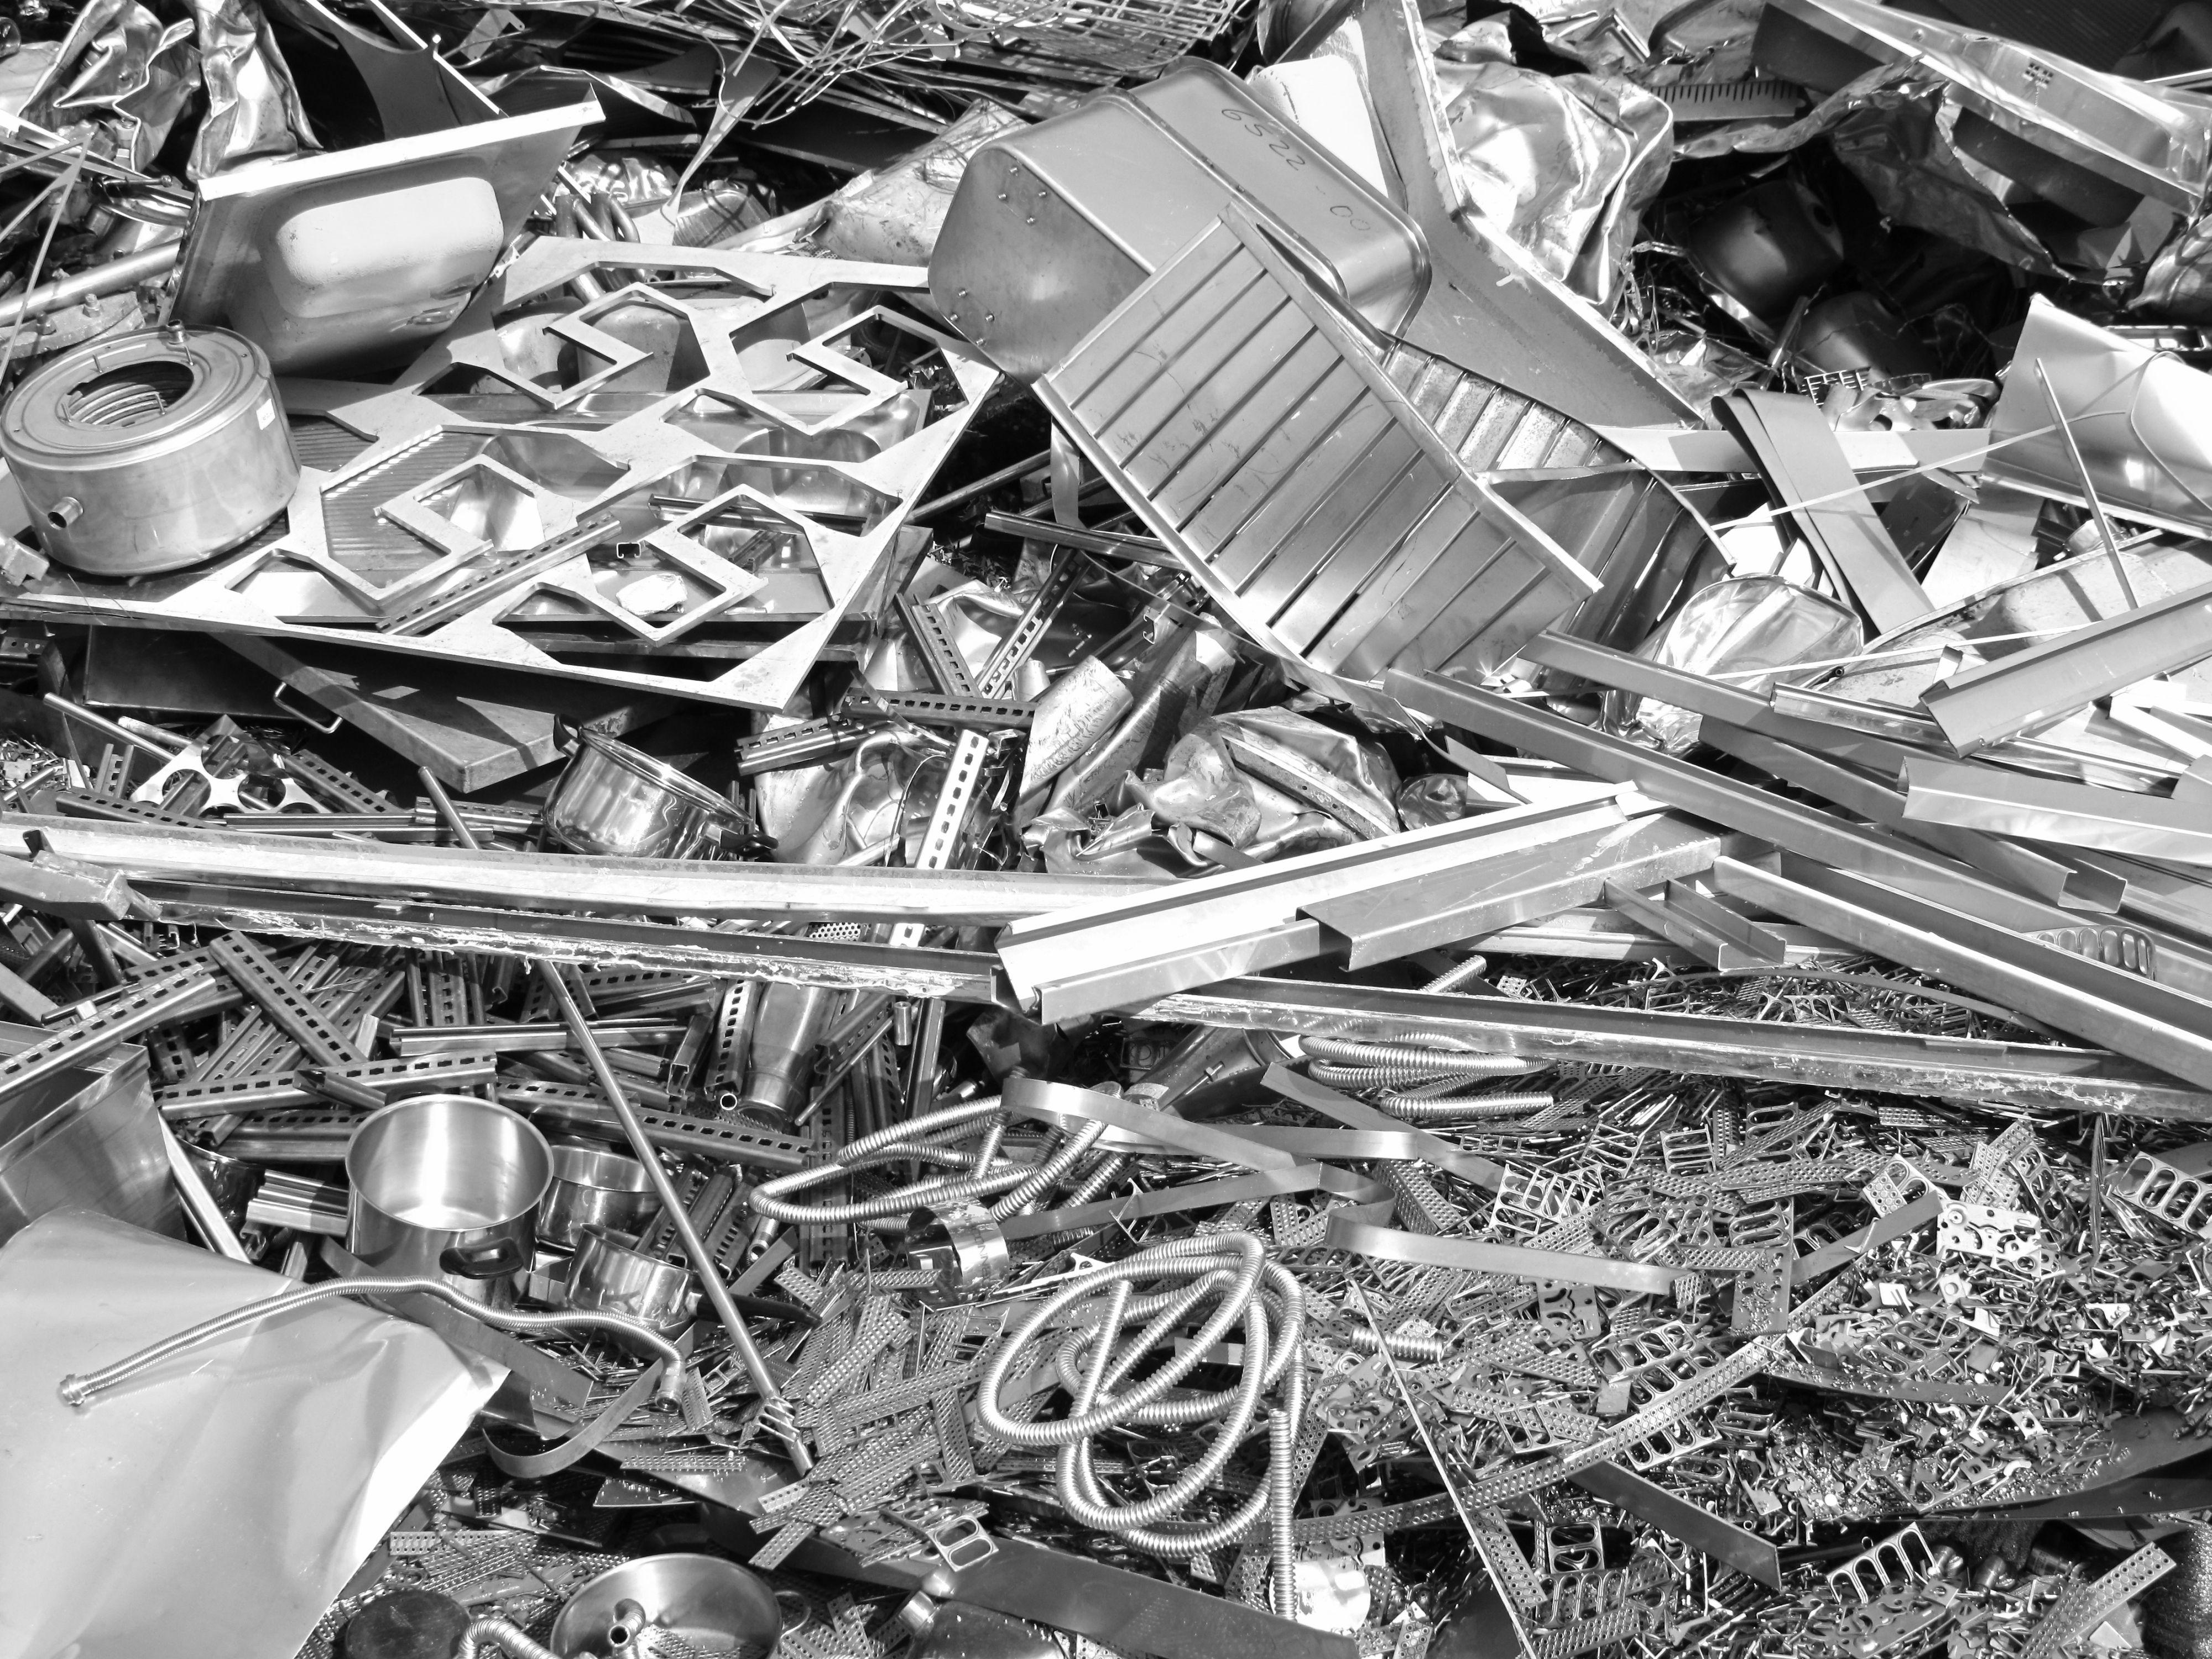 Reciclaje de chatarra en Manresa